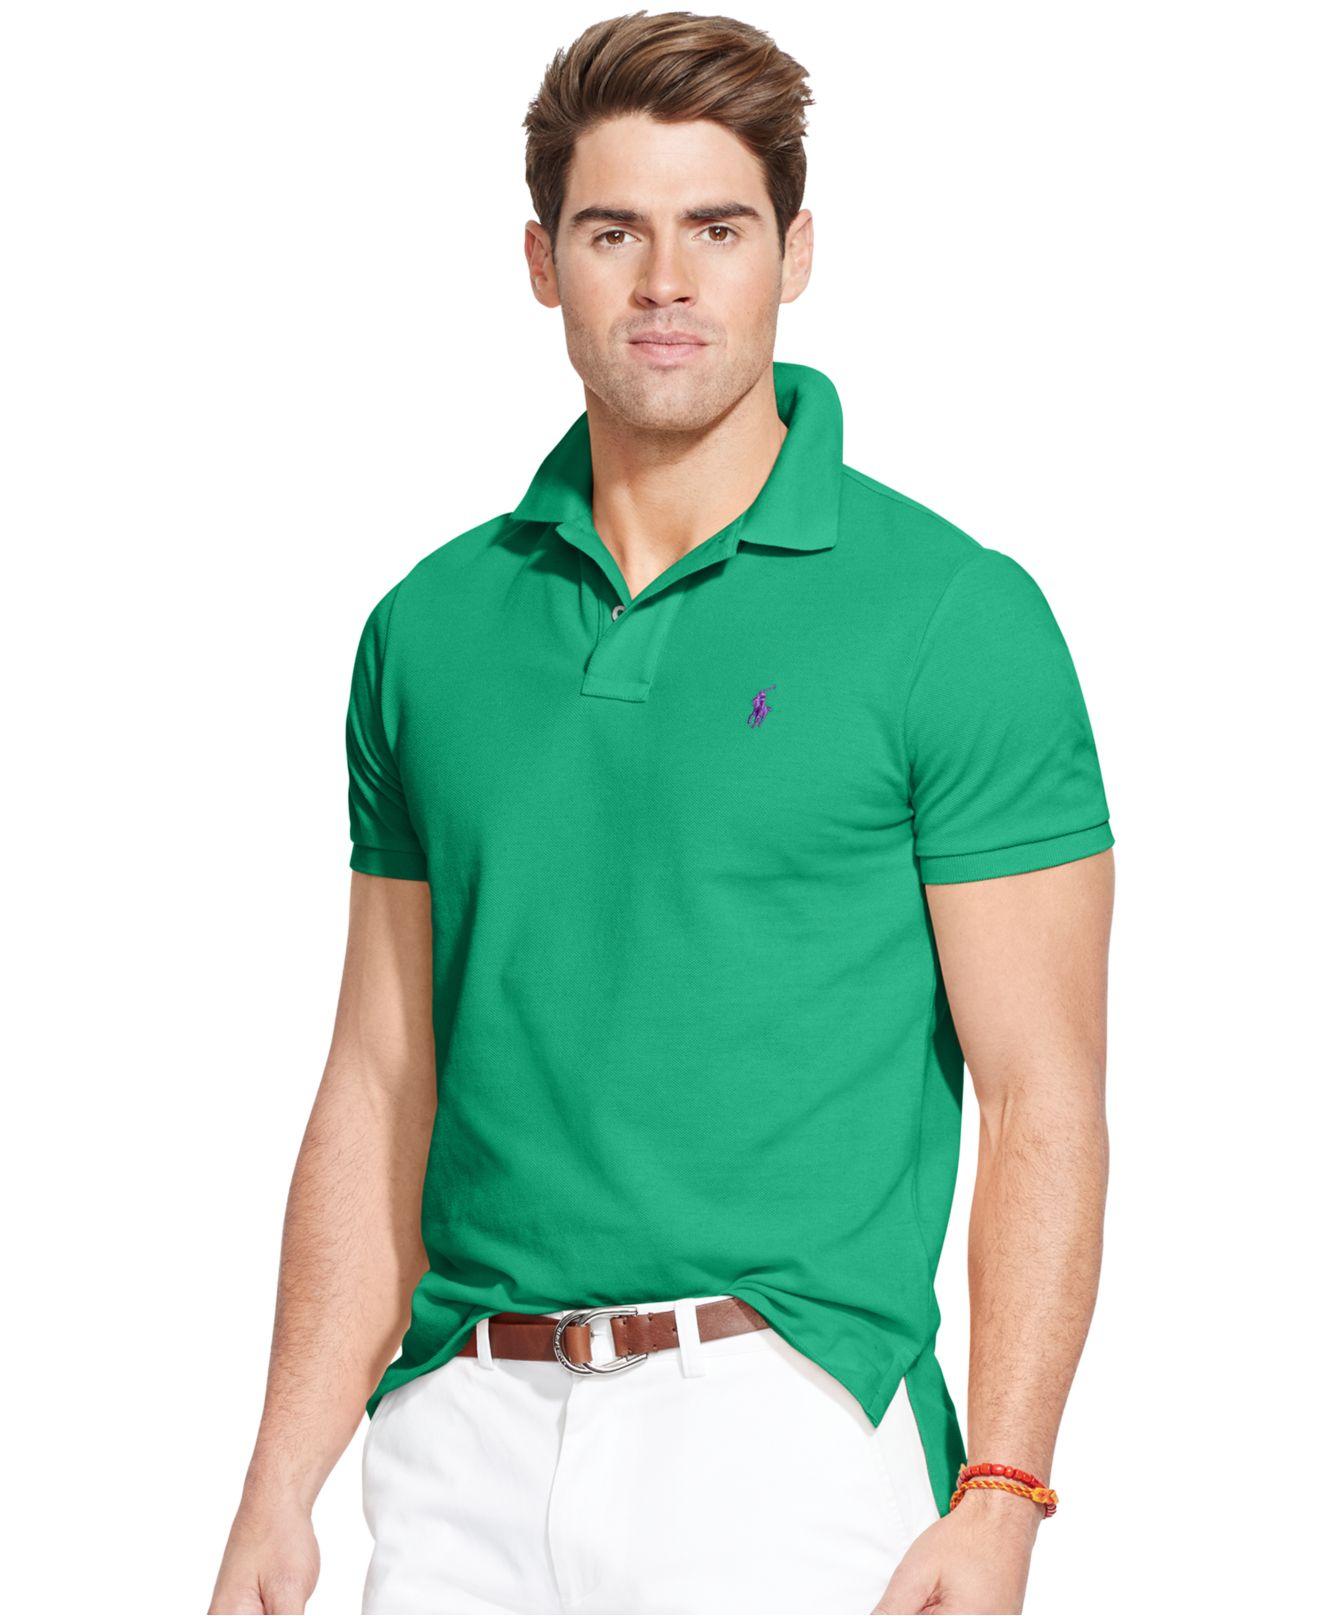 b9762b4befad4 Lyst - Polo Ralph Lauren Classic-fit Mesh Polo in Green for Men